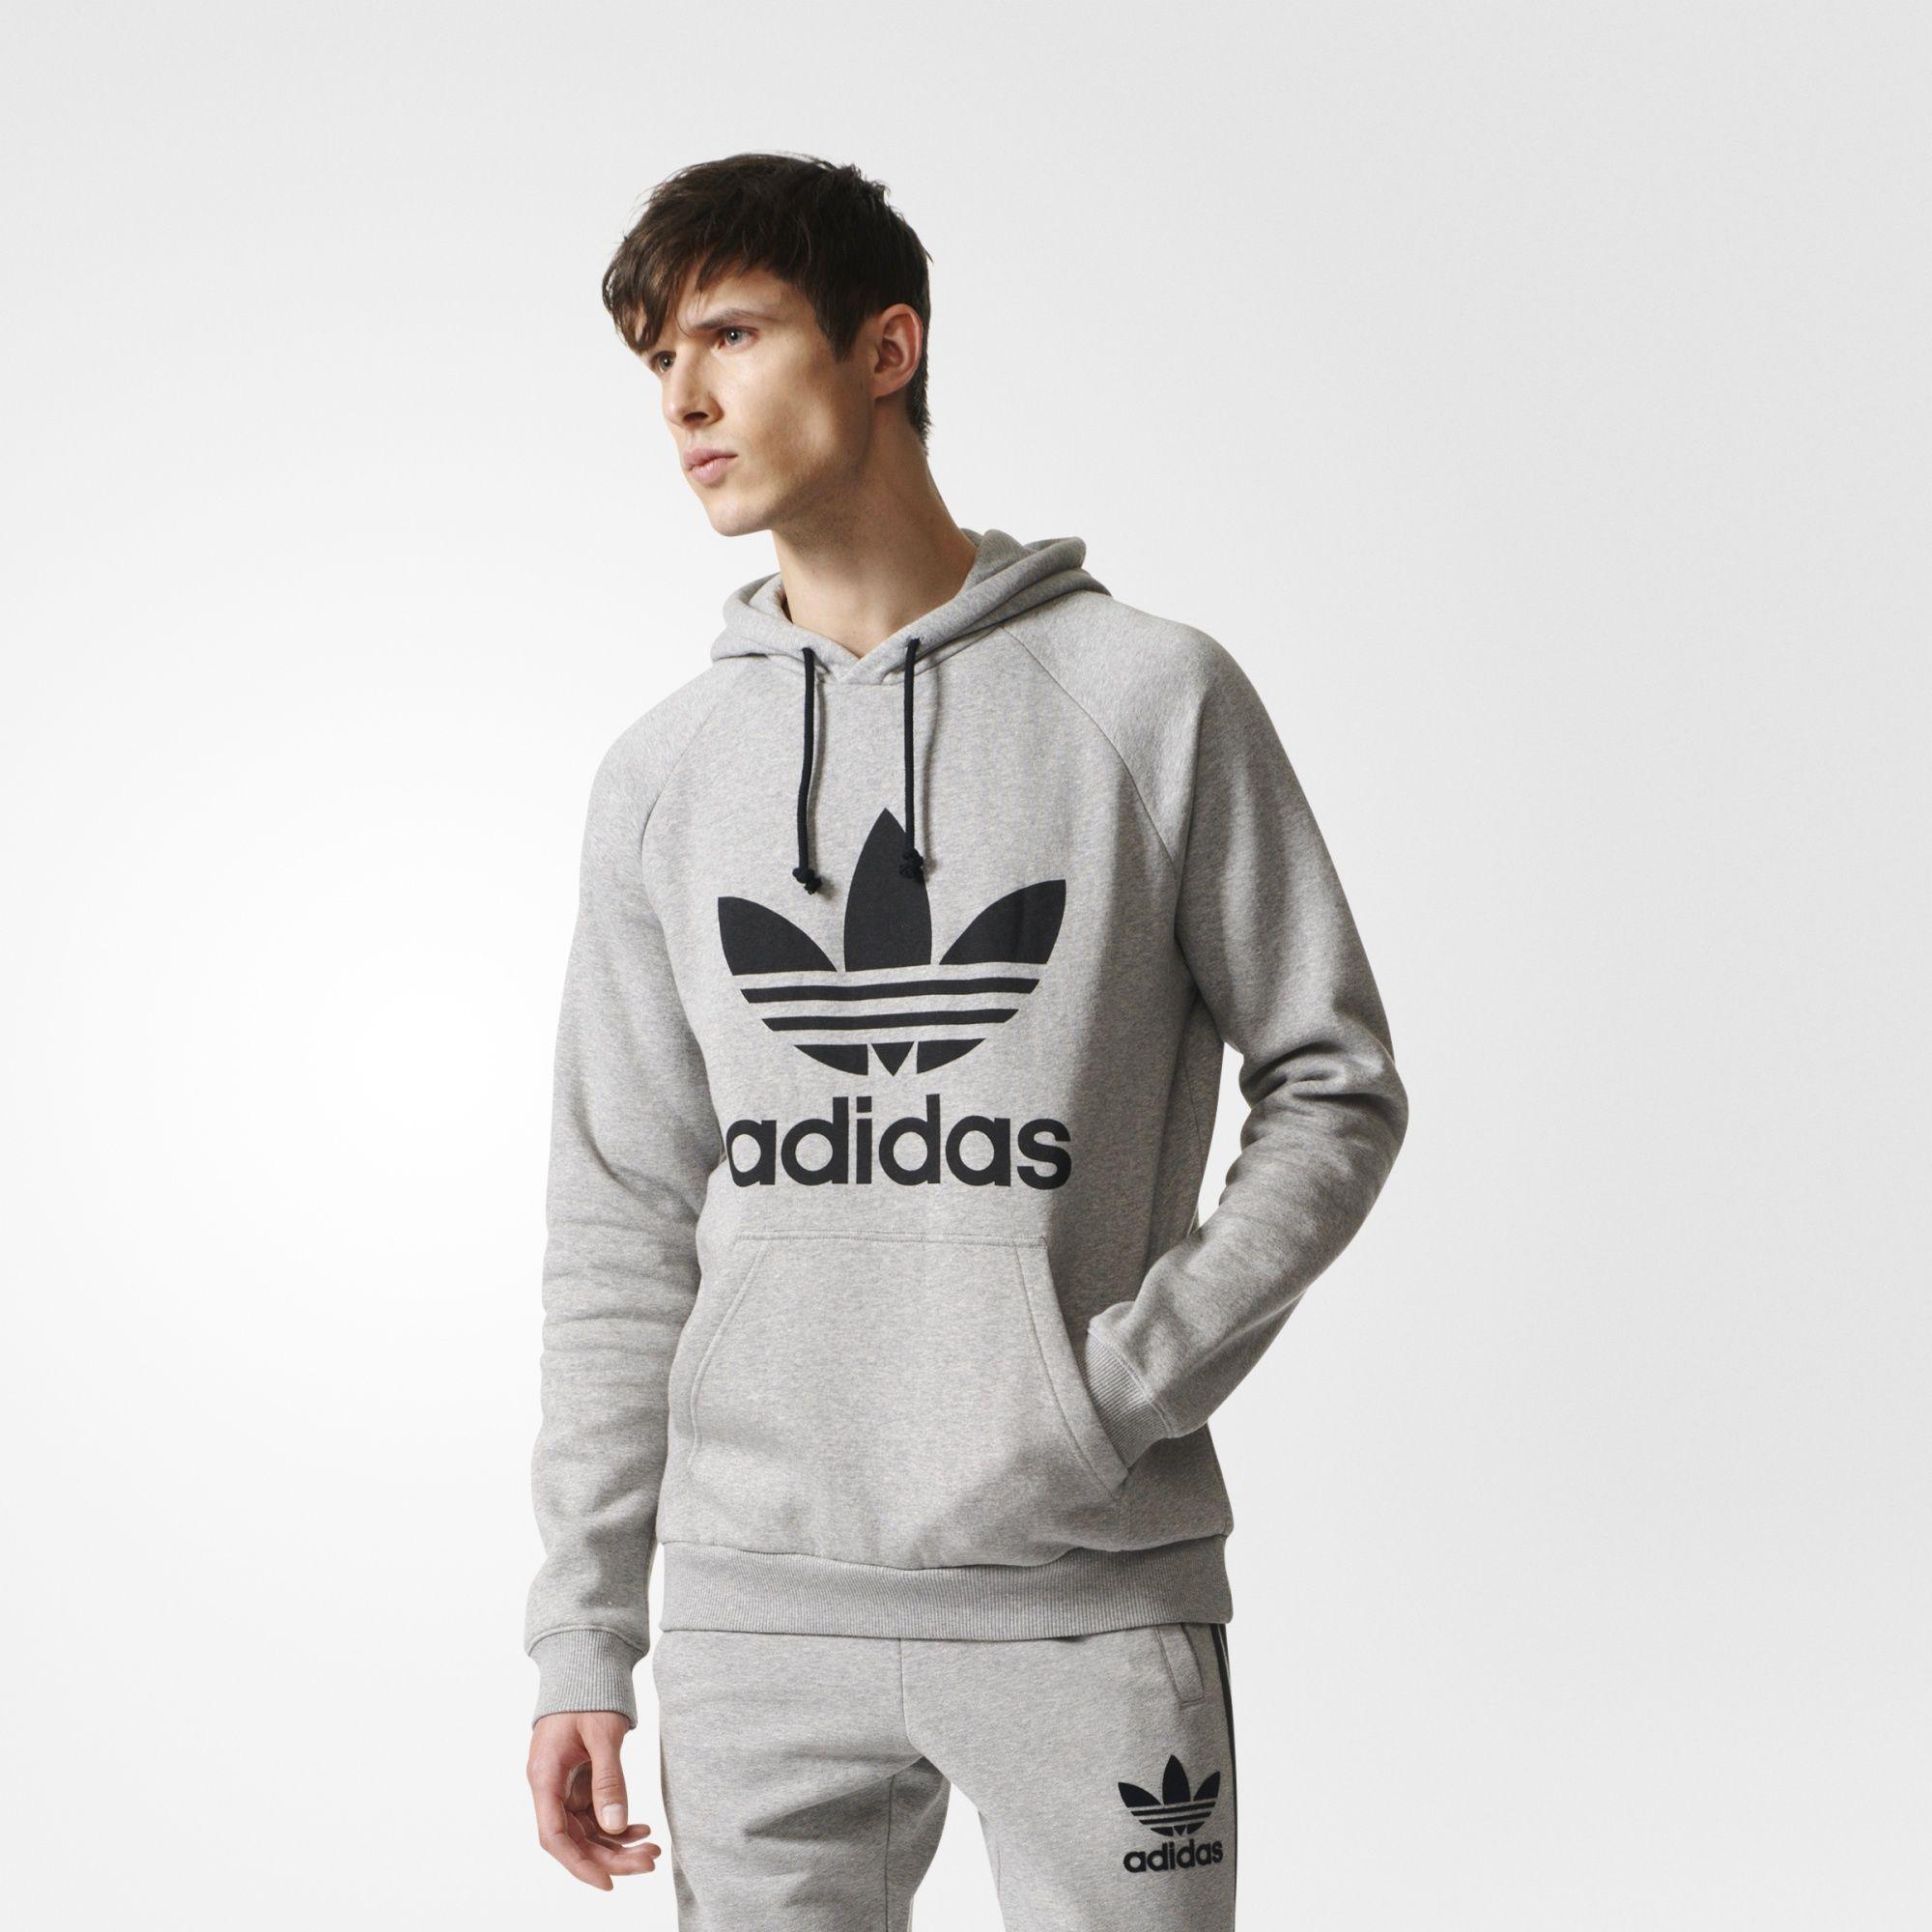 adidas Men's Trefoil Hoodie | Jackets | Adidas originals